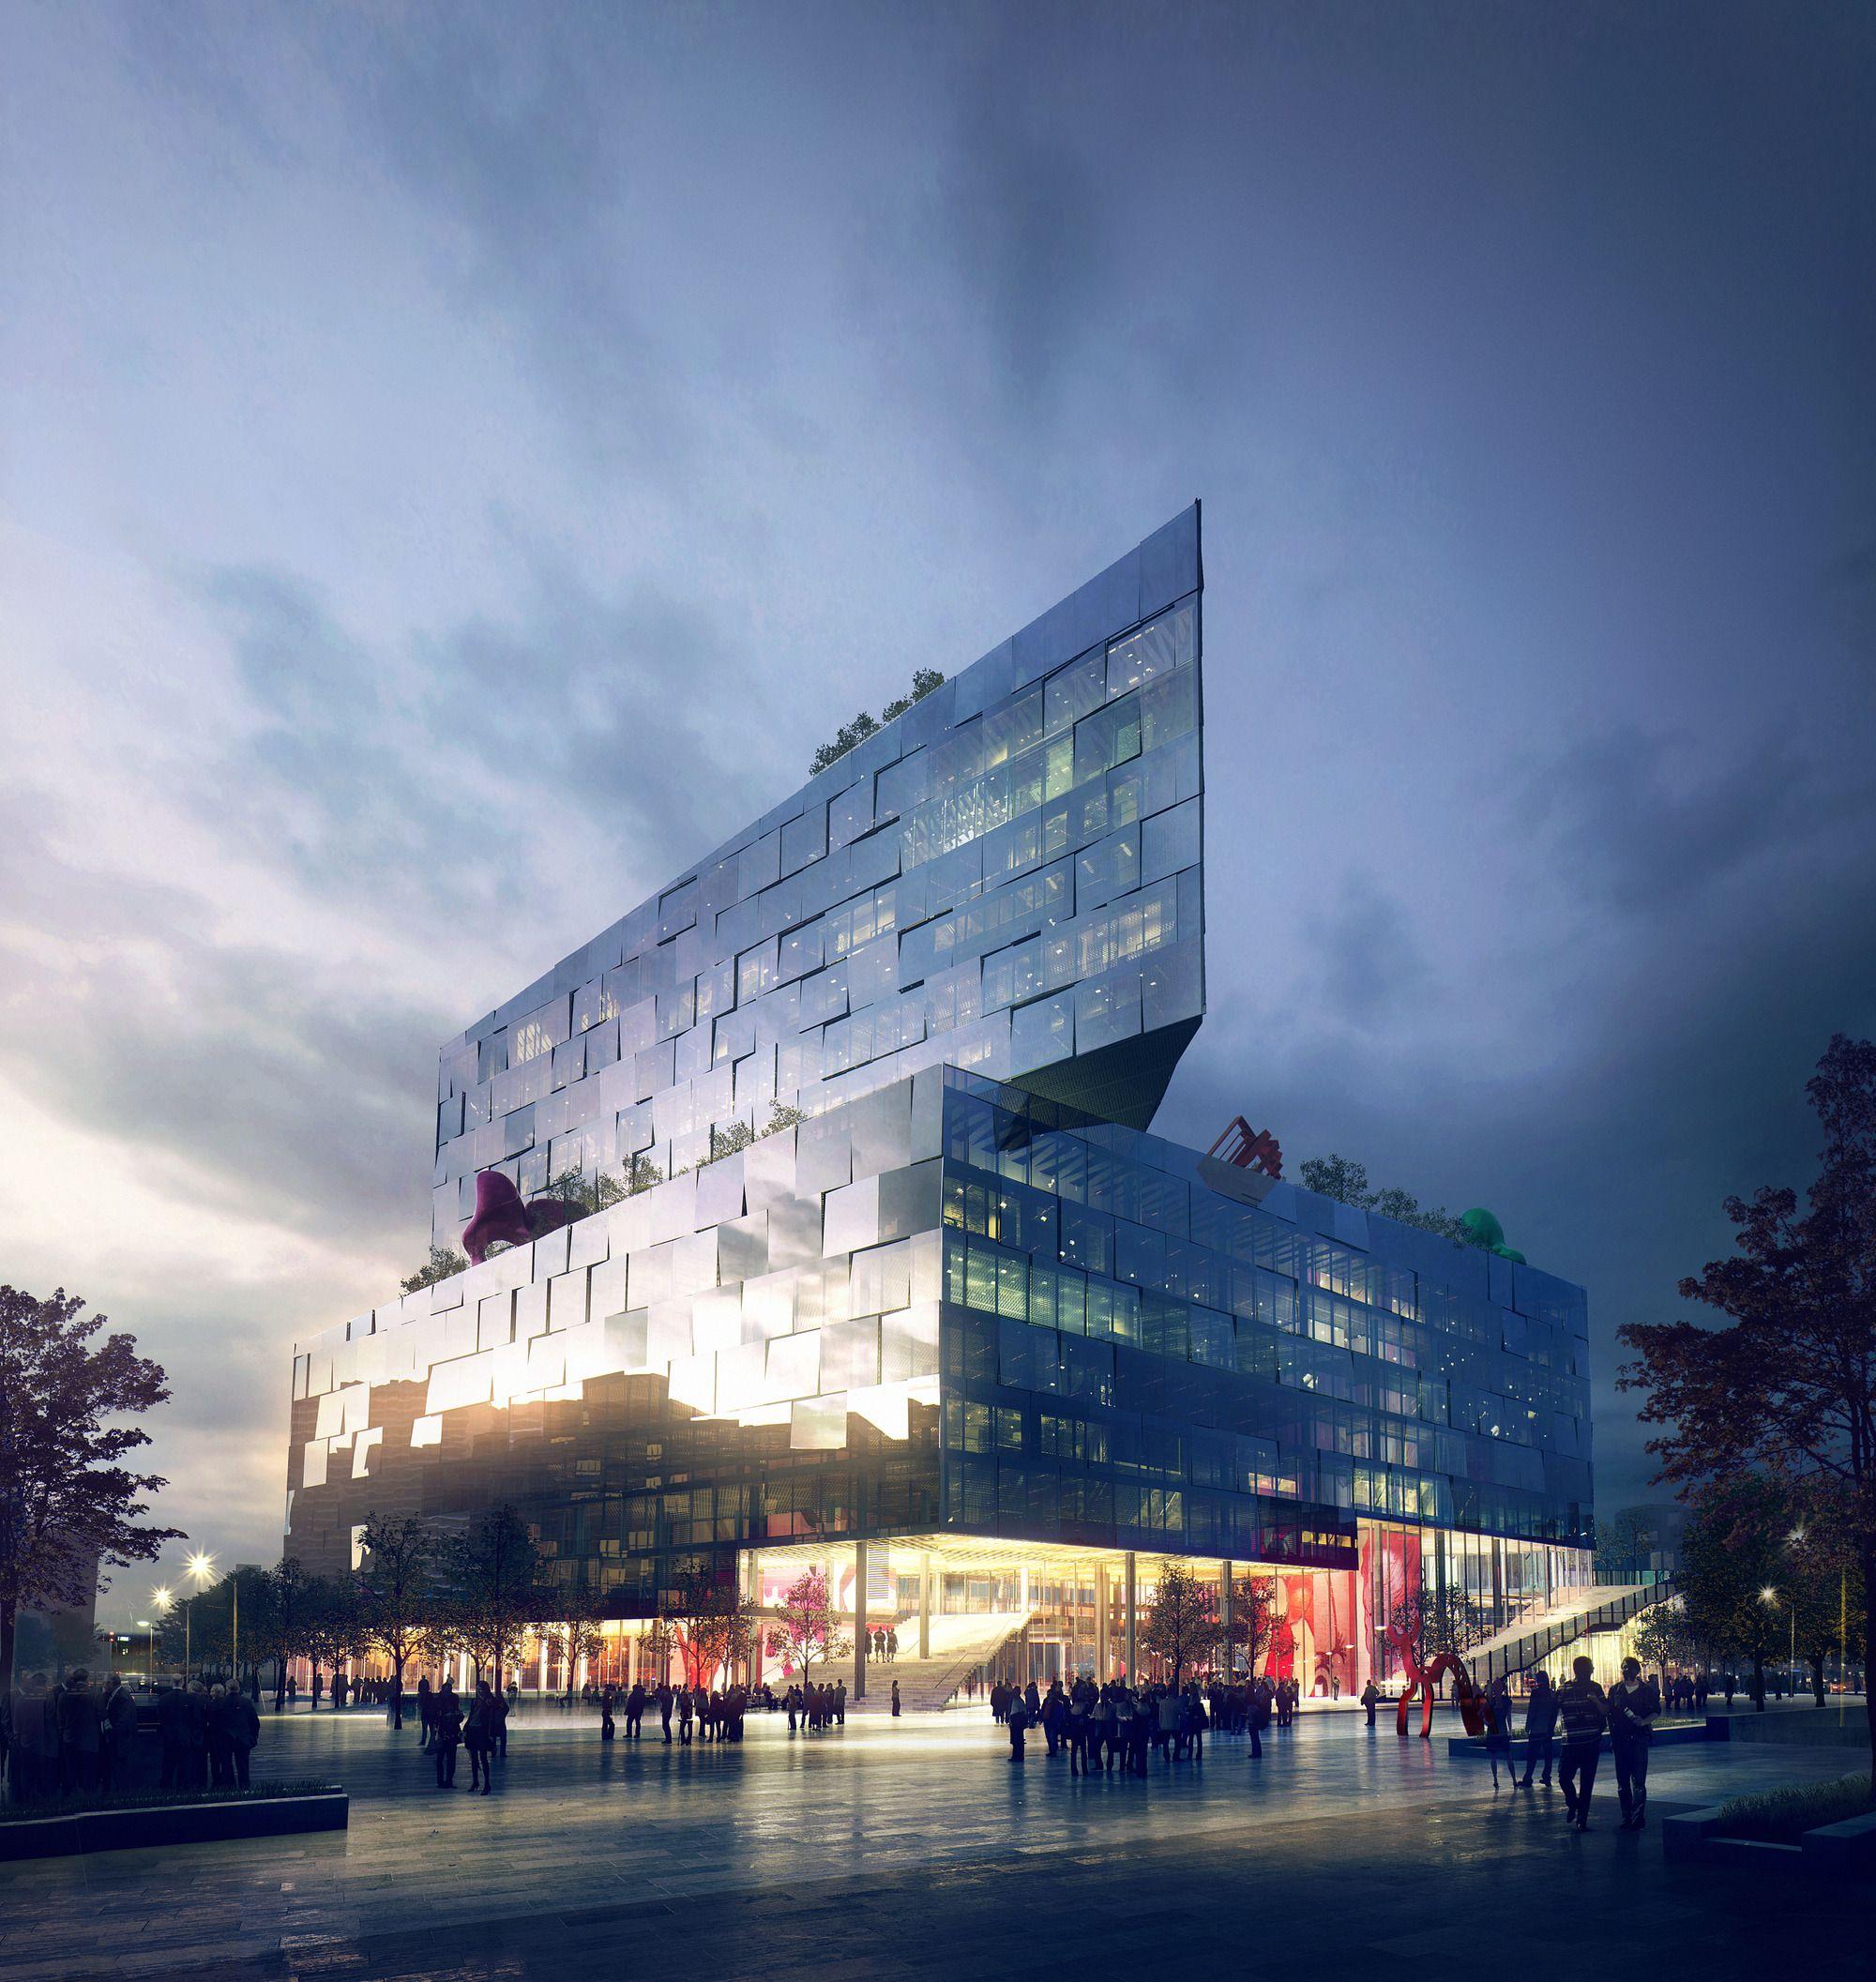 Iconic hq berlin germany 2014 by mir bergen norway ritrati di architettura - Architekturvisualisierung berlin ...